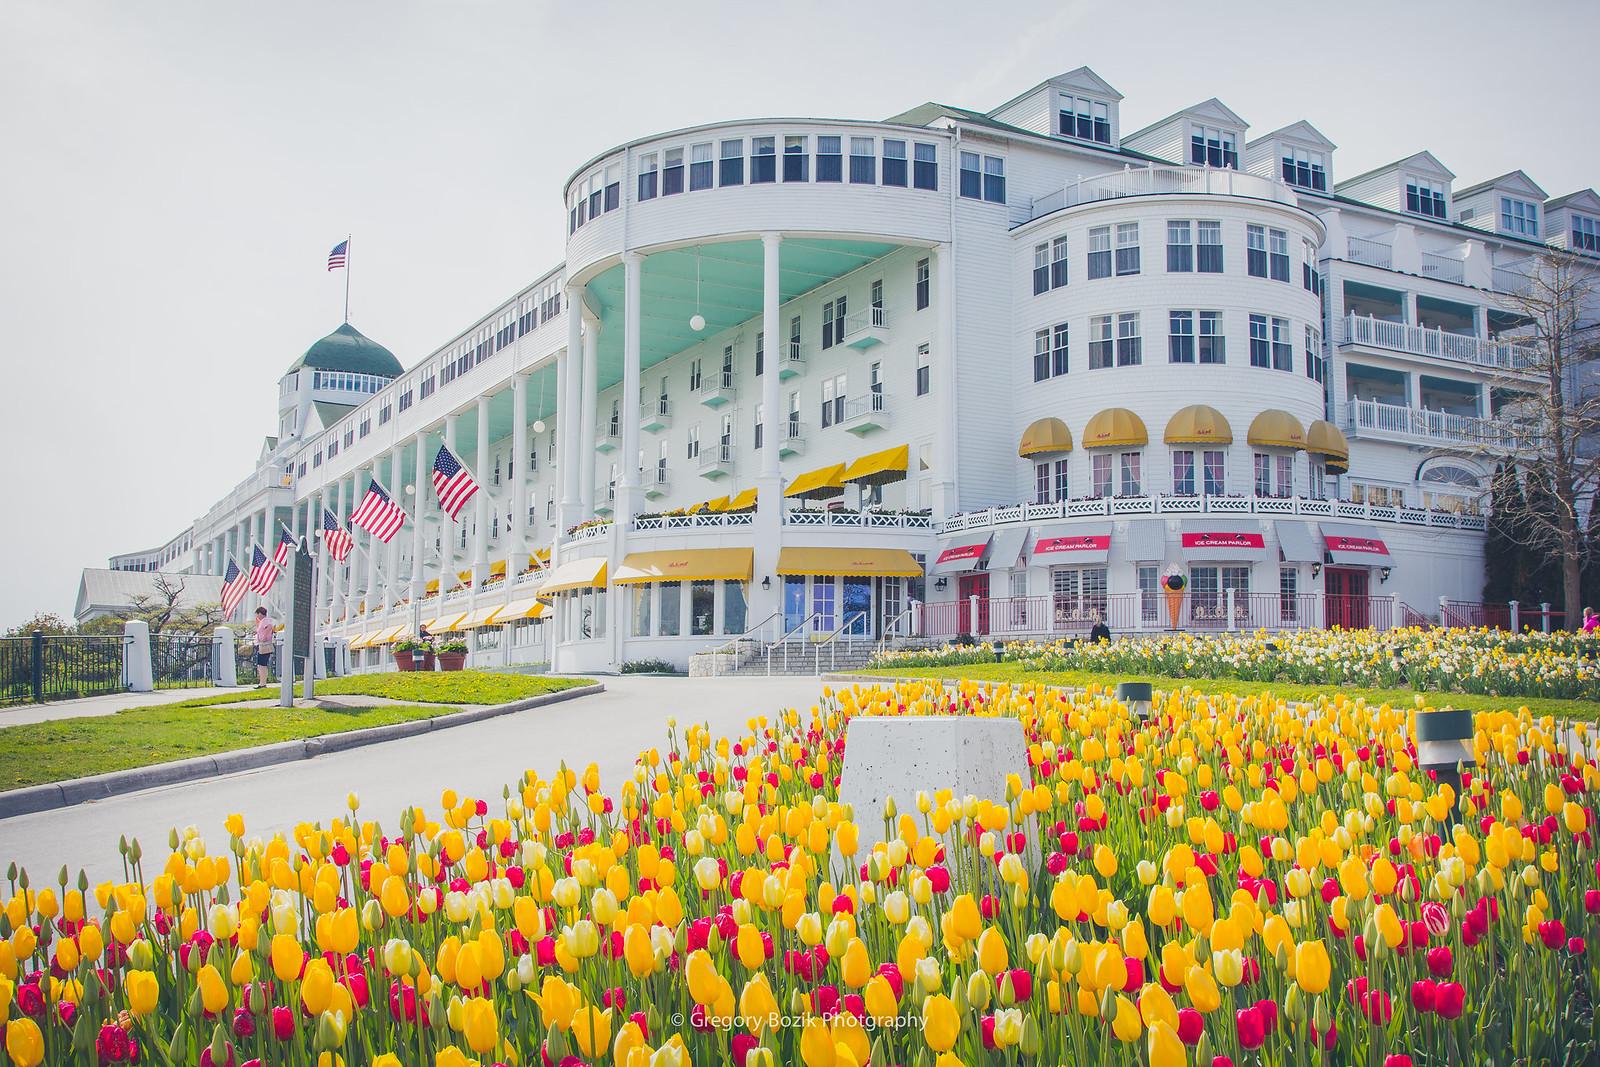 Grand Hotel (Mackinac Island) - May 2013